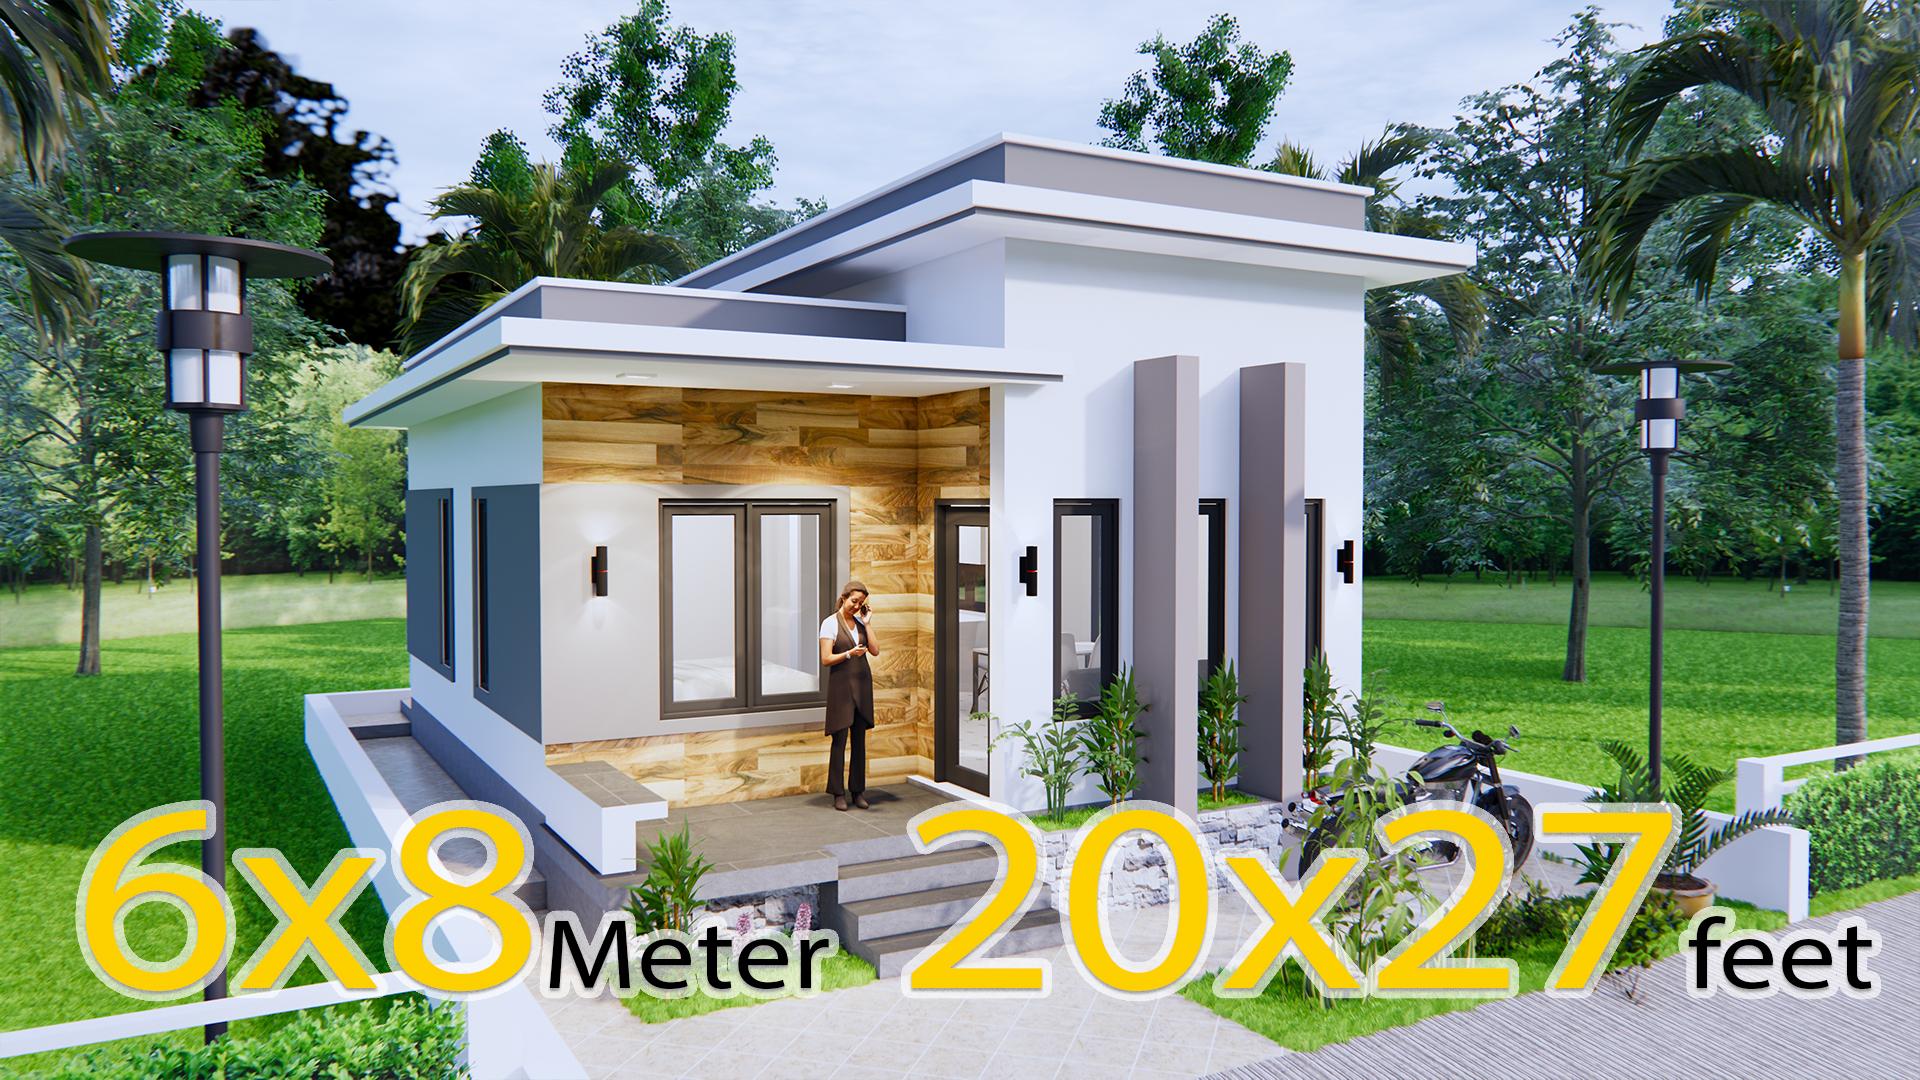 Small House Design 6x8 Meter 20x27 Feet Terrace Roof House Design 3d